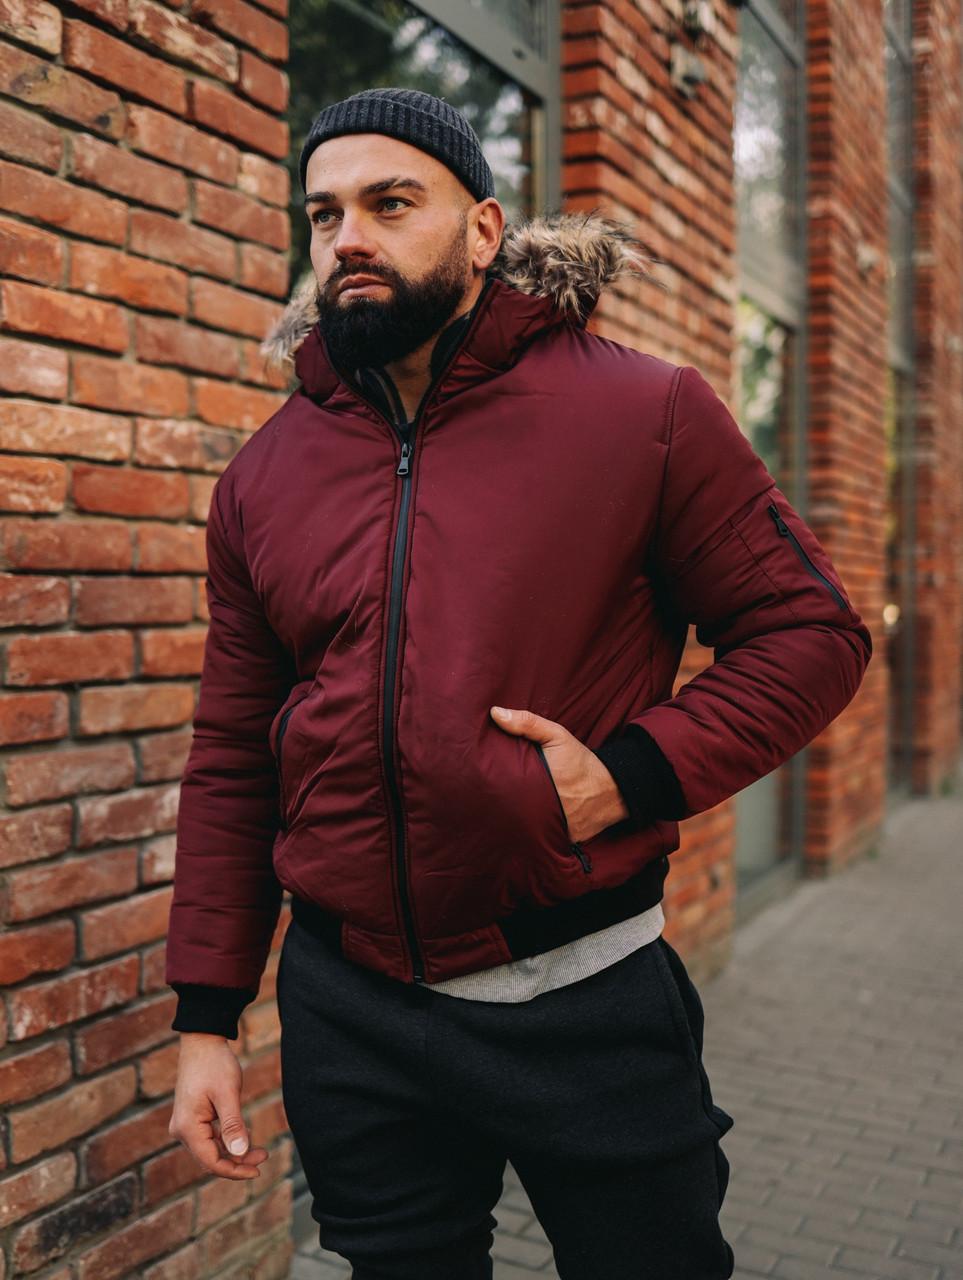 Мужская зимняя бордовая куртка, Jacket Winter (bordo), короткая зимняя куртка